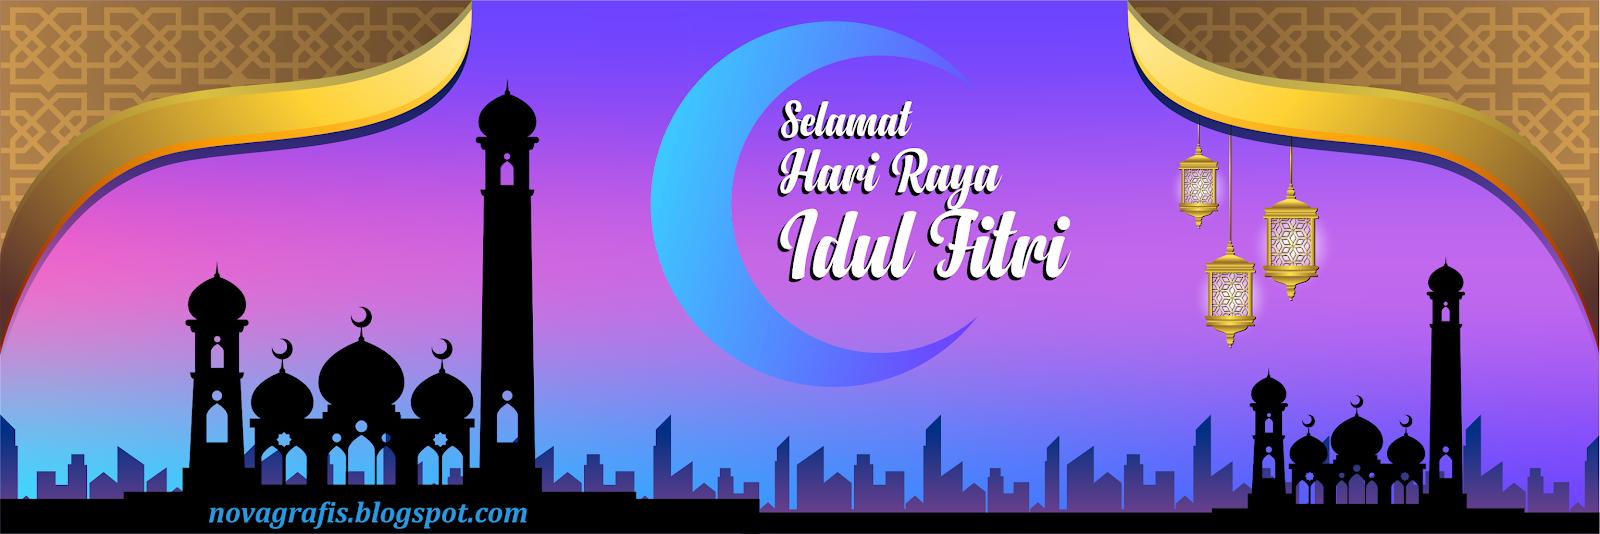 Ucapan Hari Raya Idul Fitri 2019 Cdr